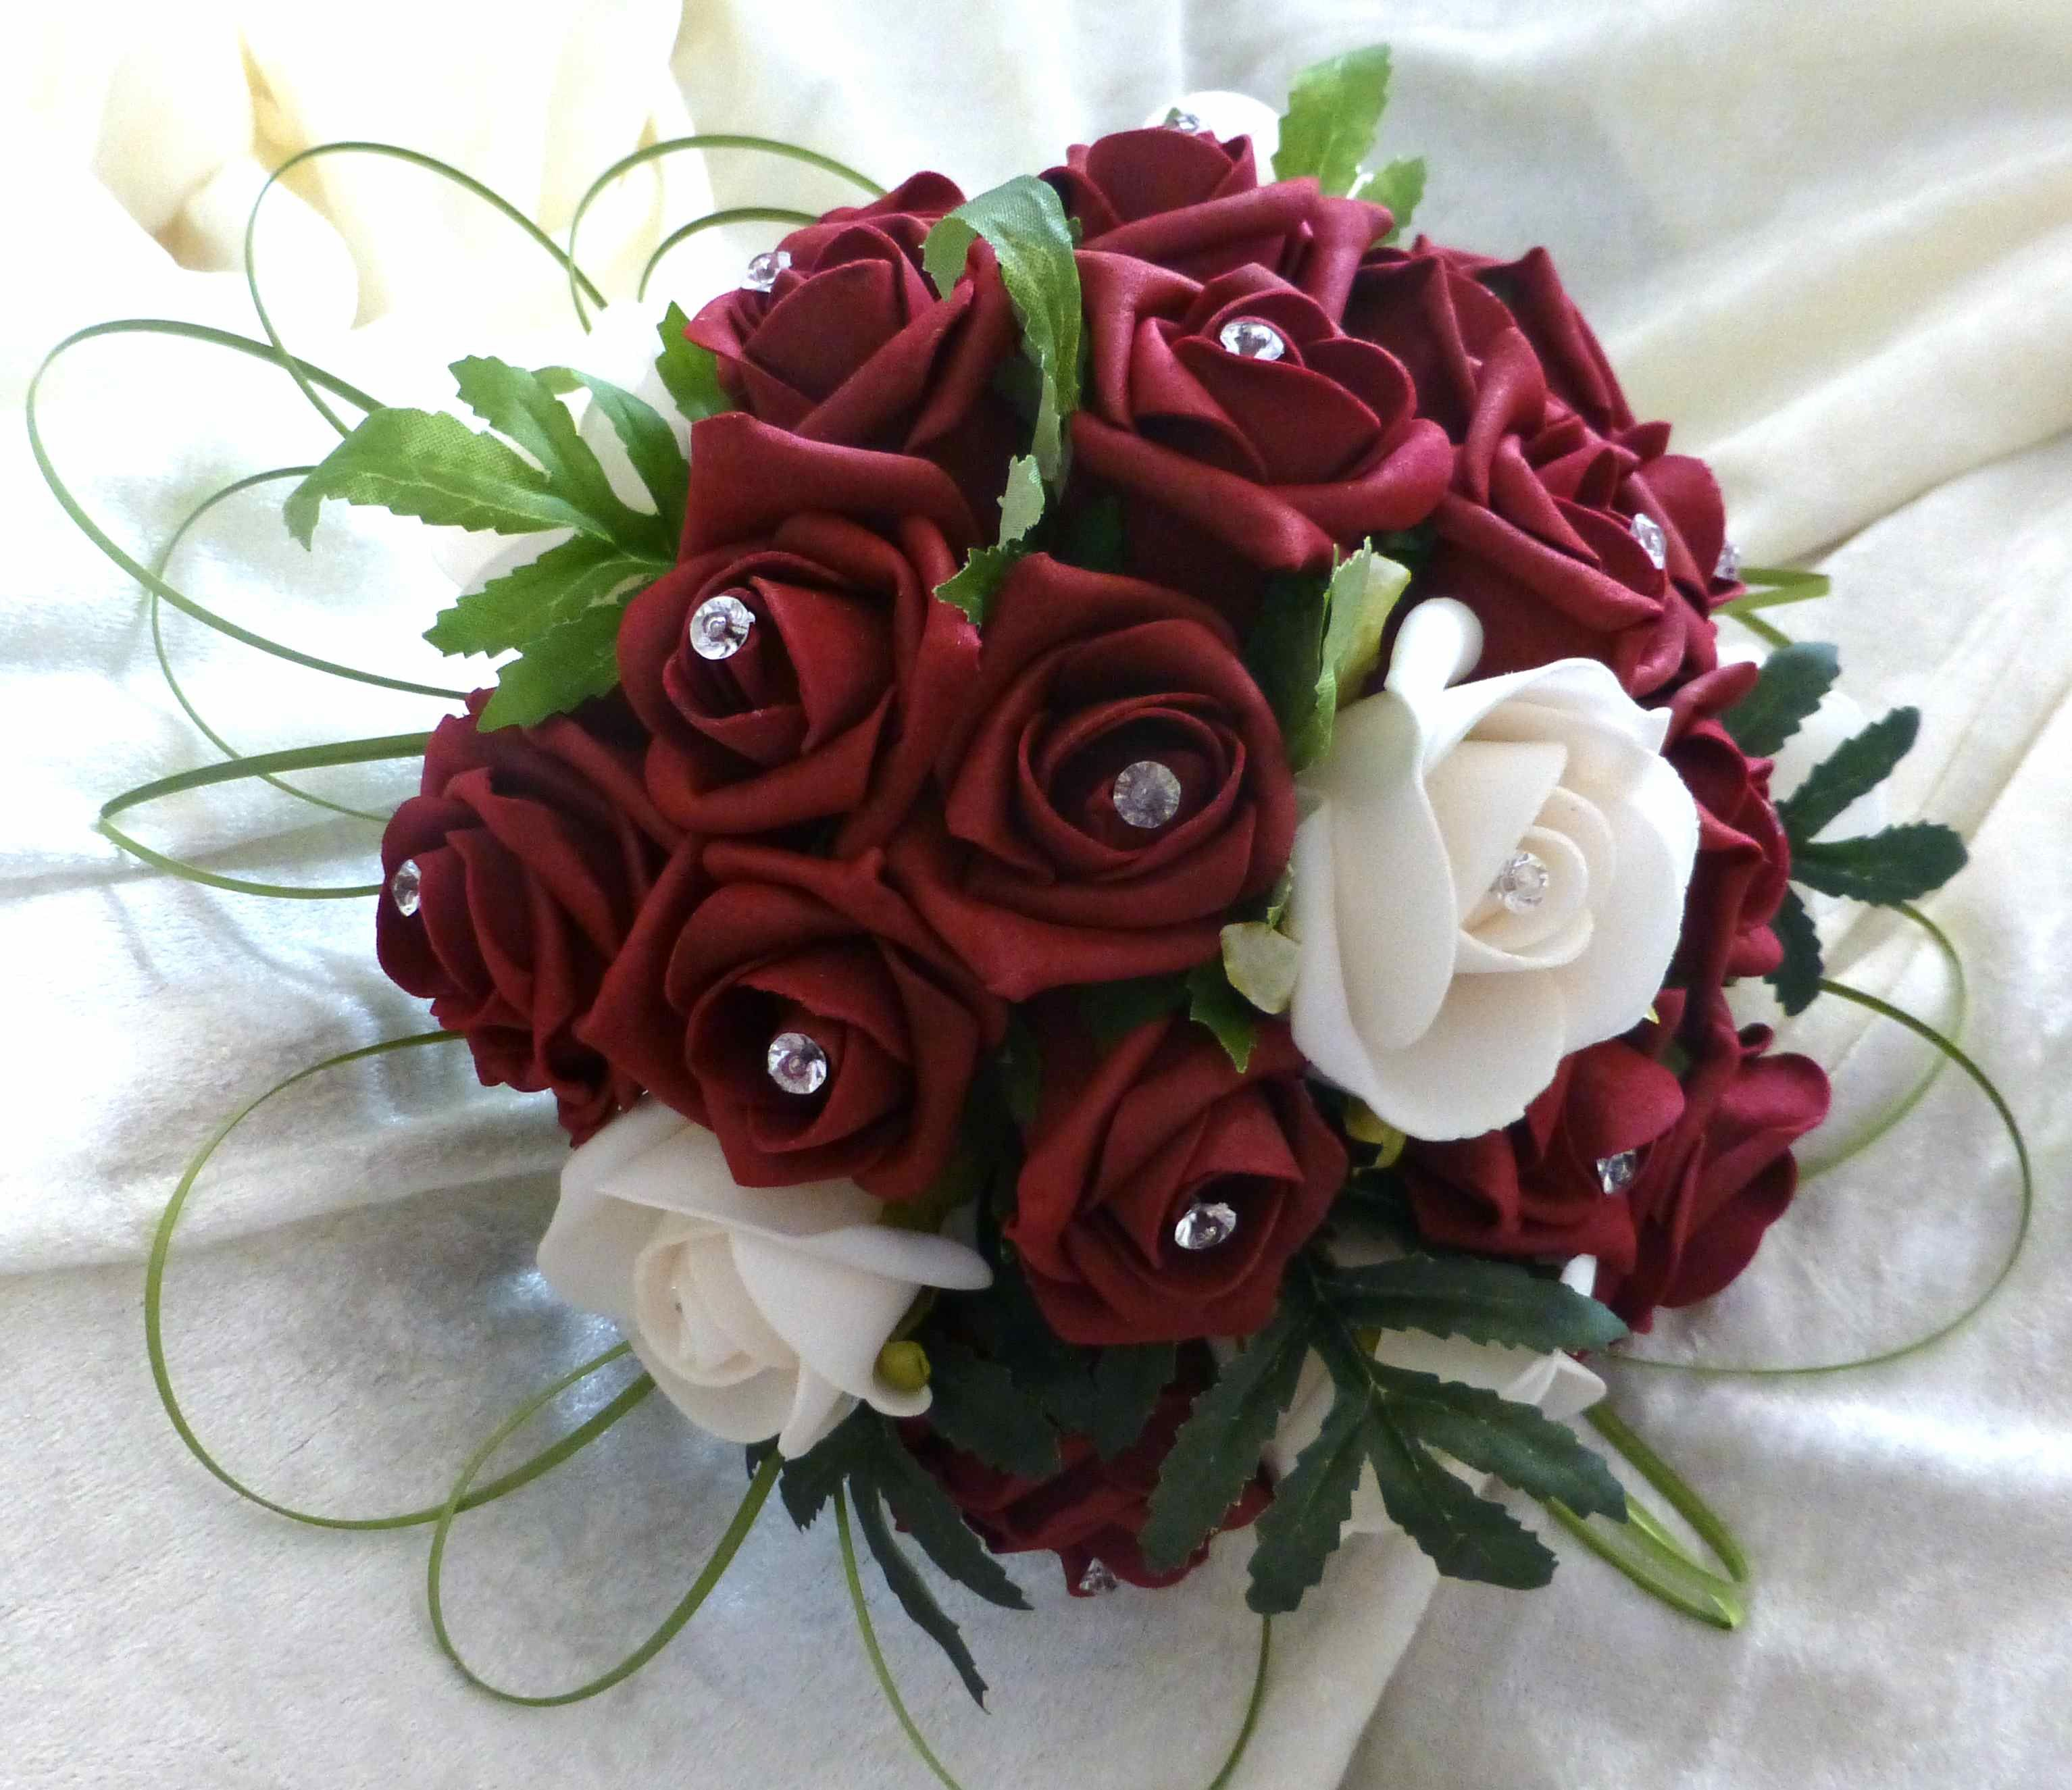 Artistic Design Using Onion Grass Foam Roses And Diamantes